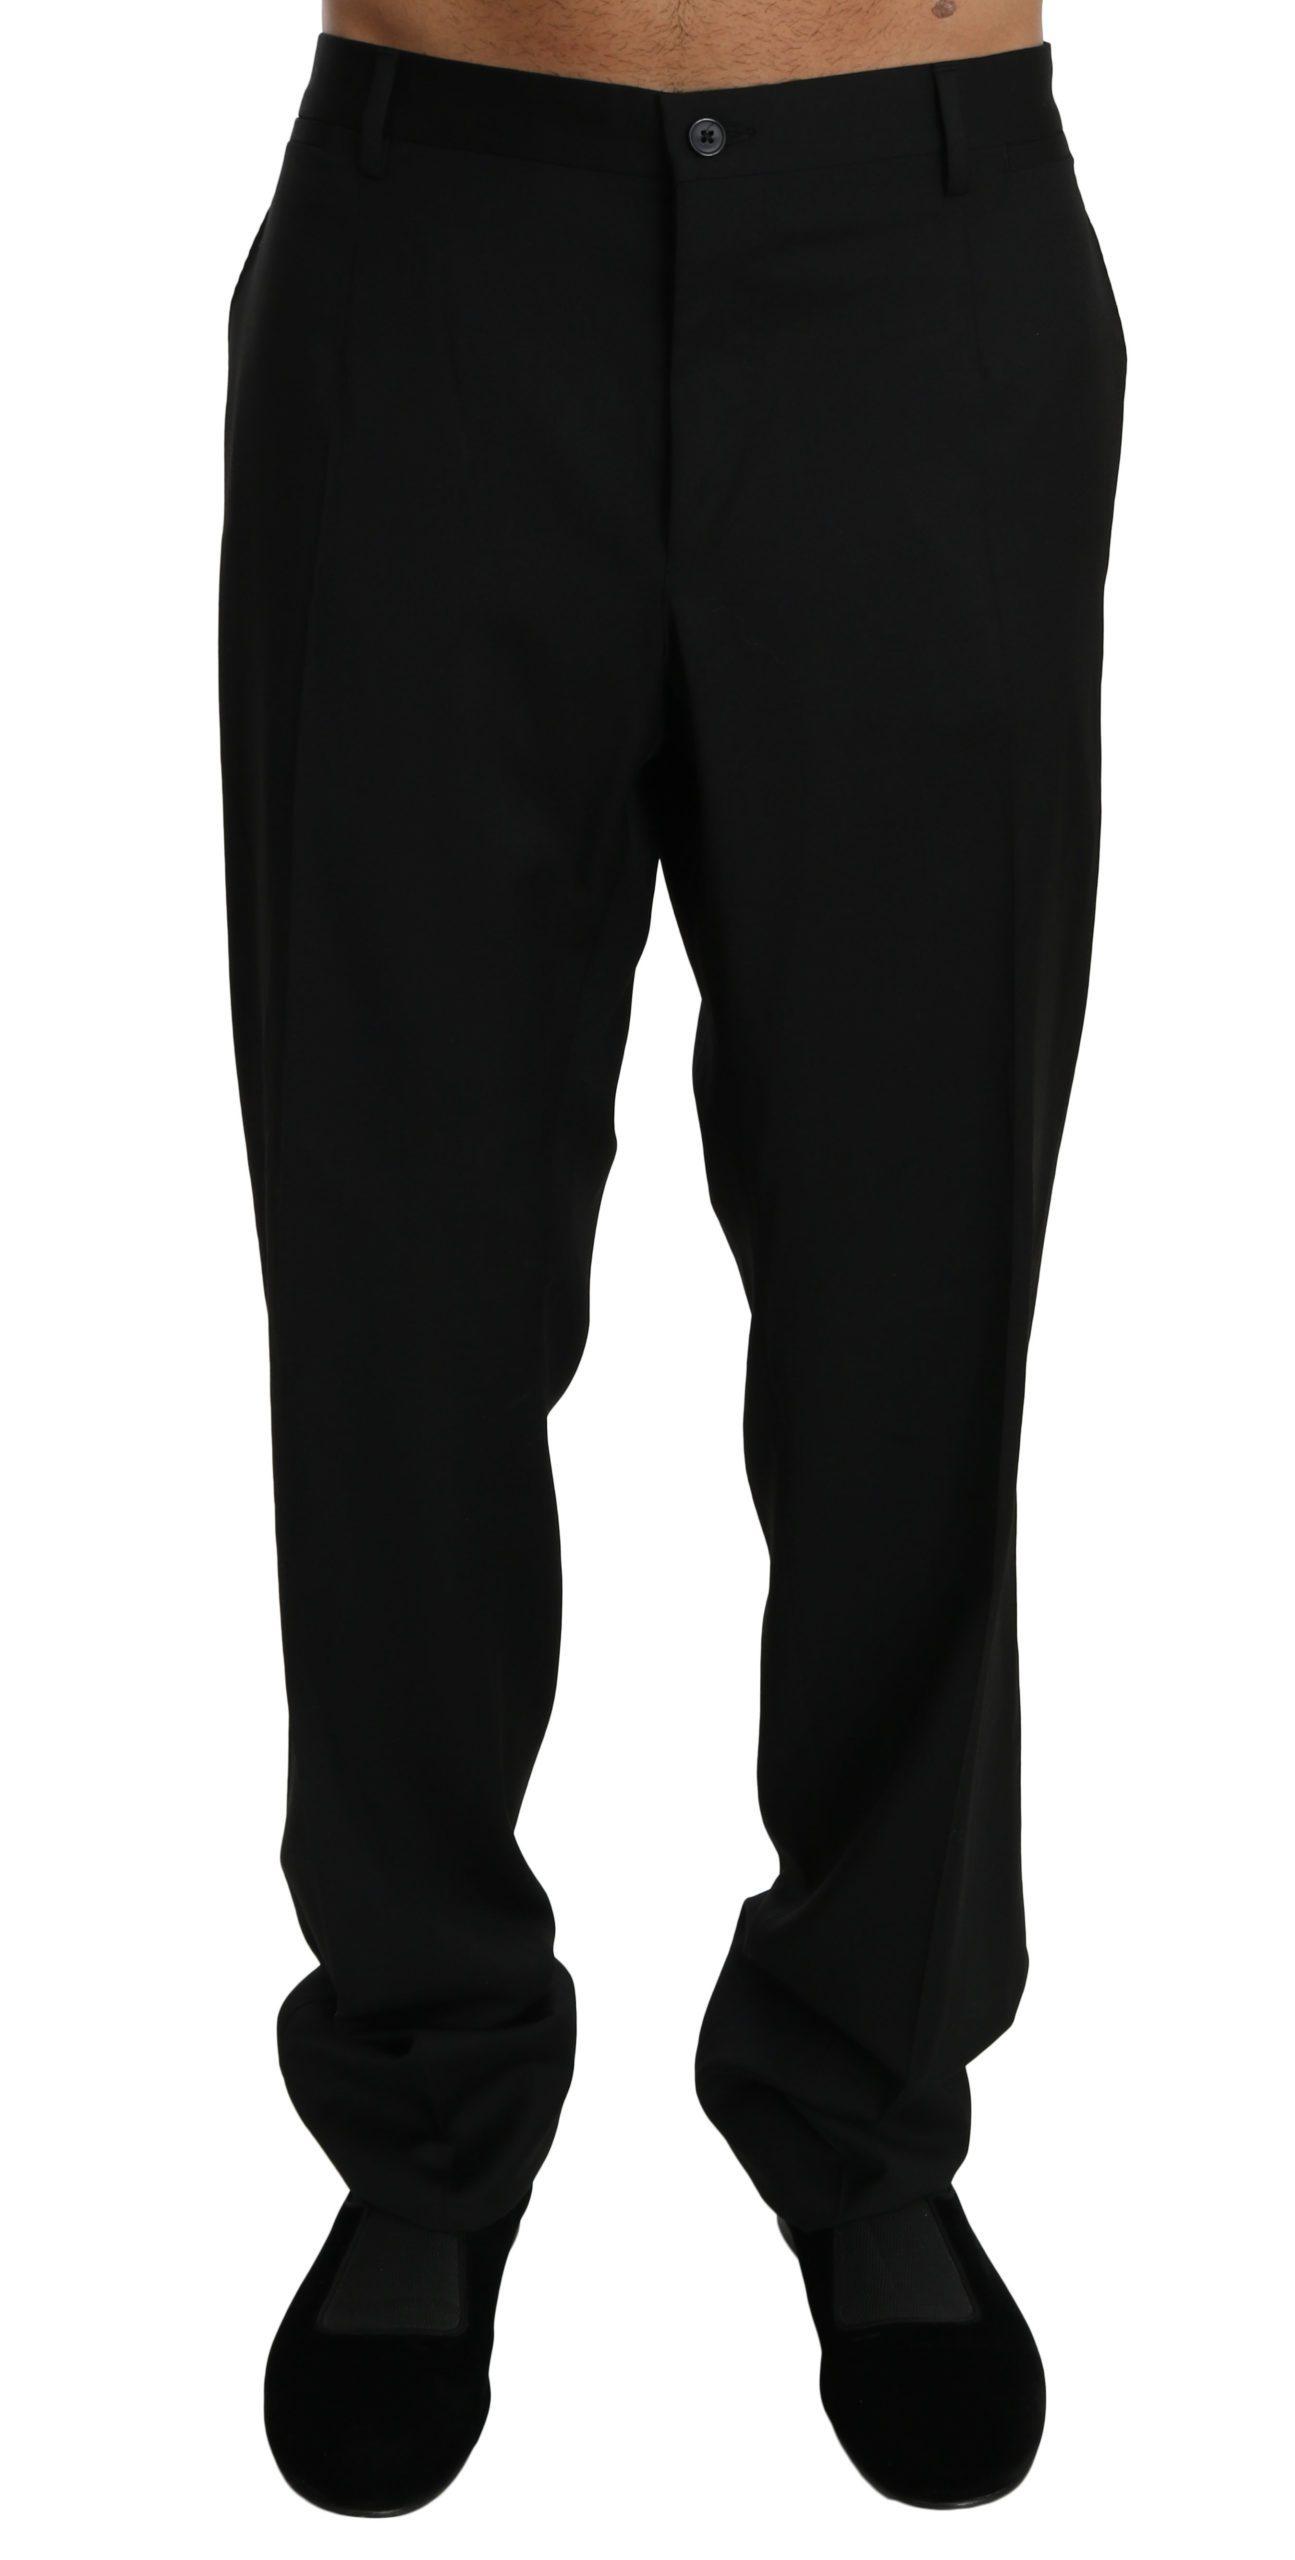 Dolce & Gabbana Men's Slim Formal Wool Trouser Black PAN70755 - IT58 | XXL